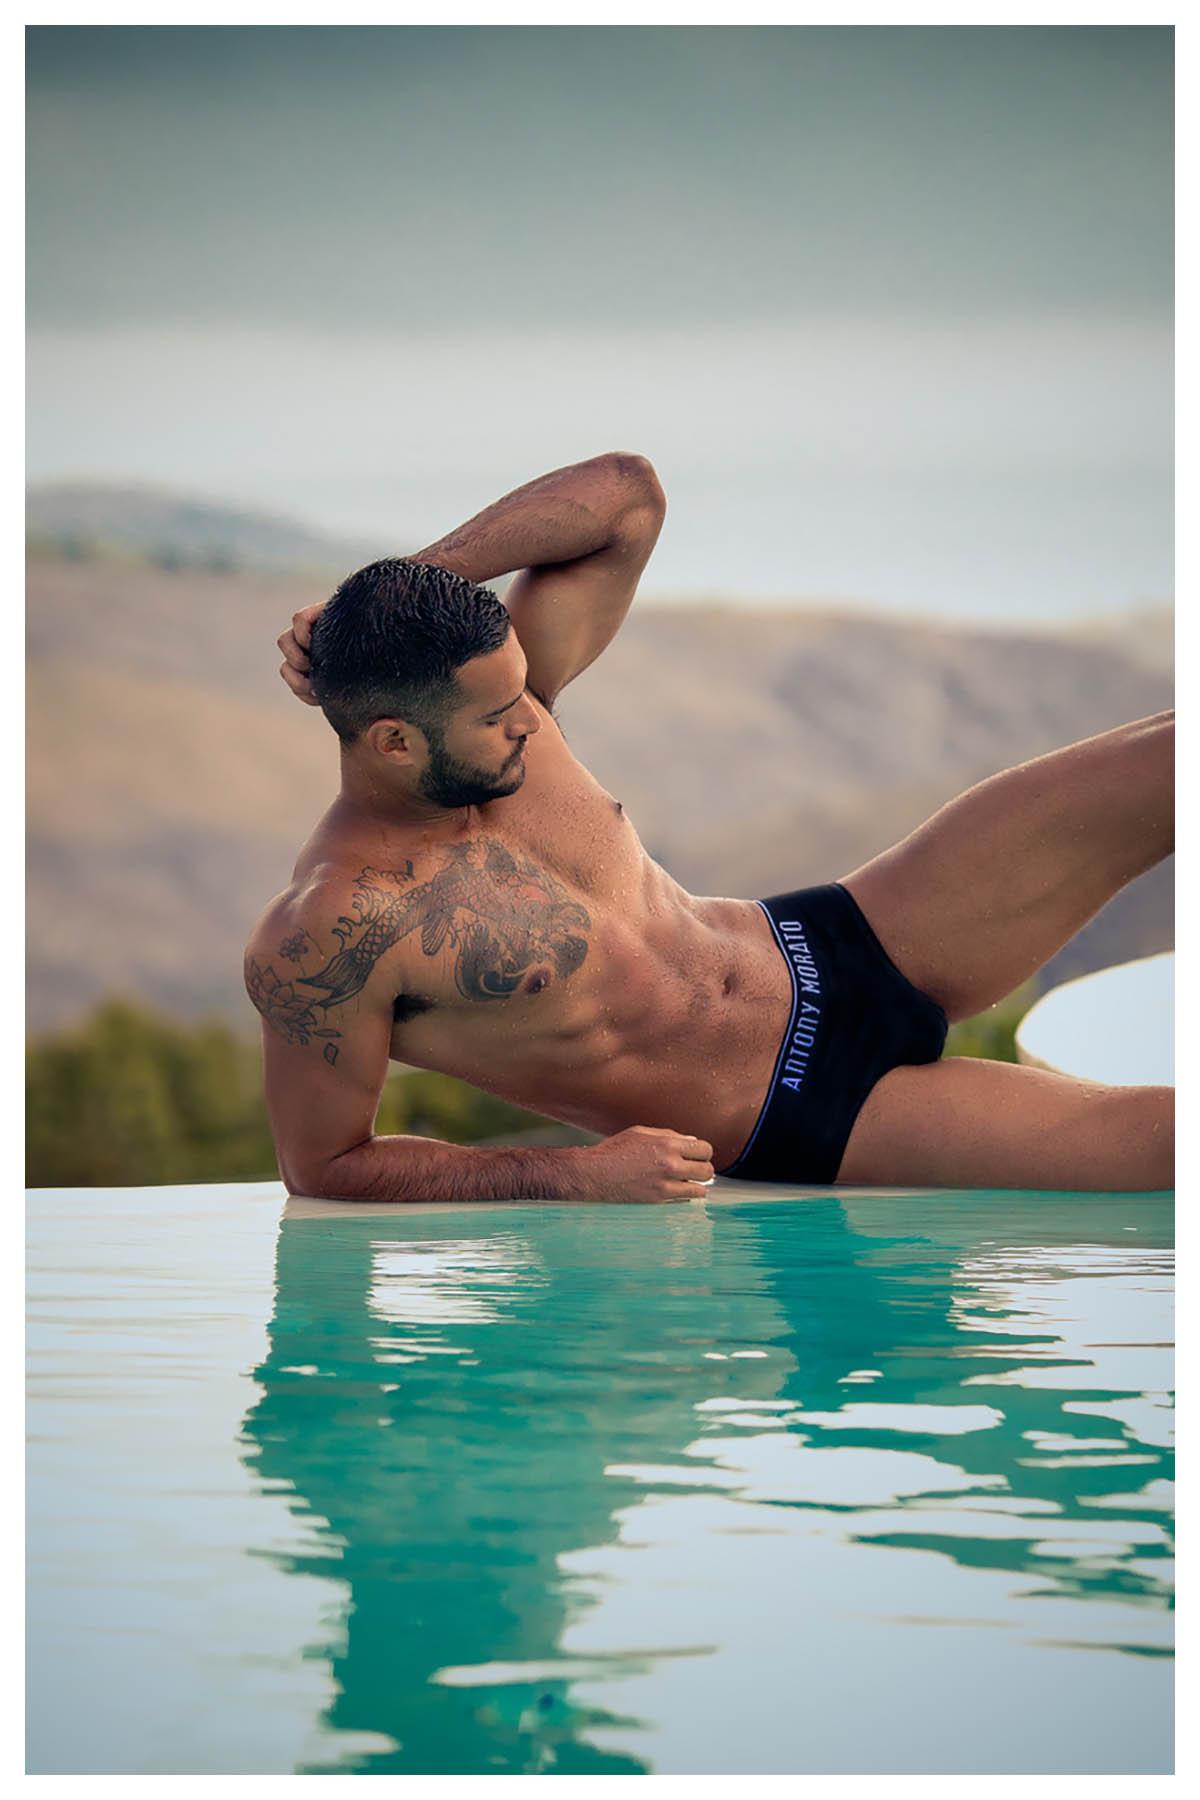 Alejandro Lopez x Roberto Viccaro X YUP MAGAZINE